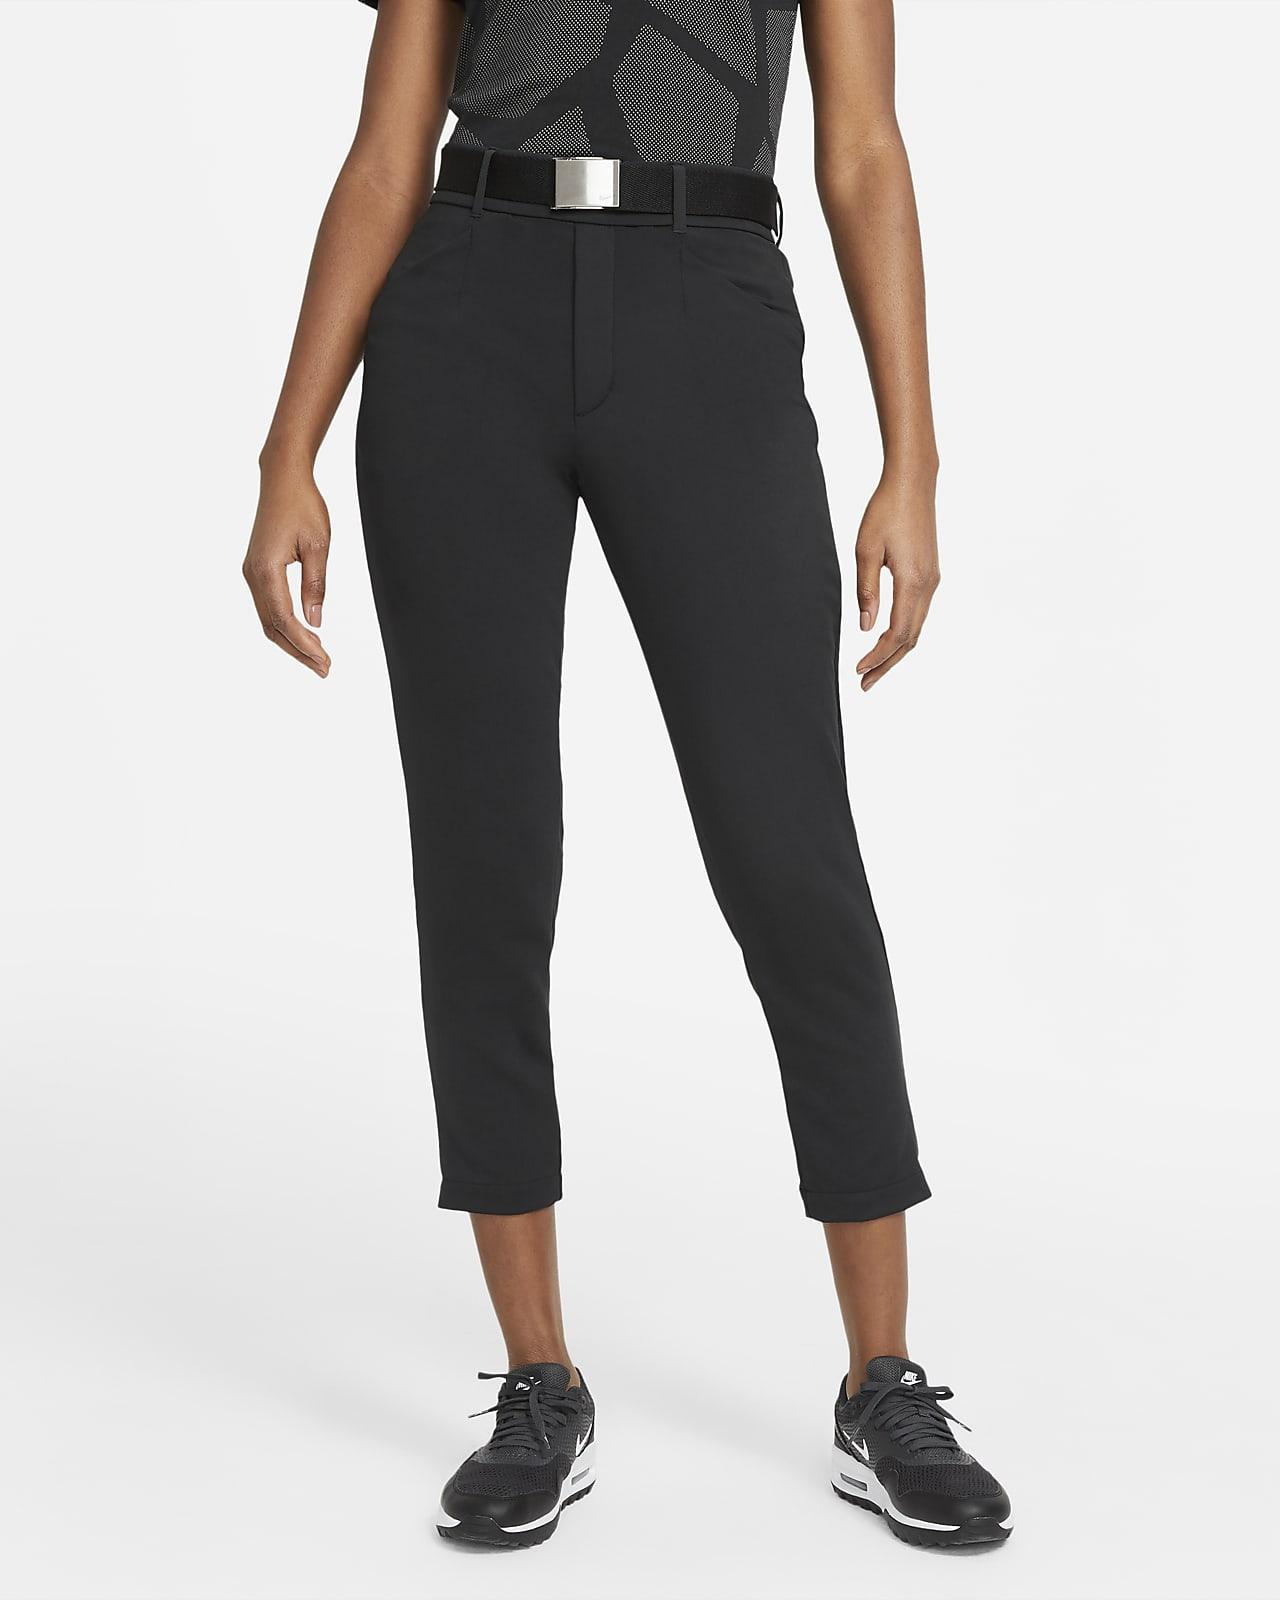 Nike Dri-FIT UV Ace golfbukse med smal passform til dame